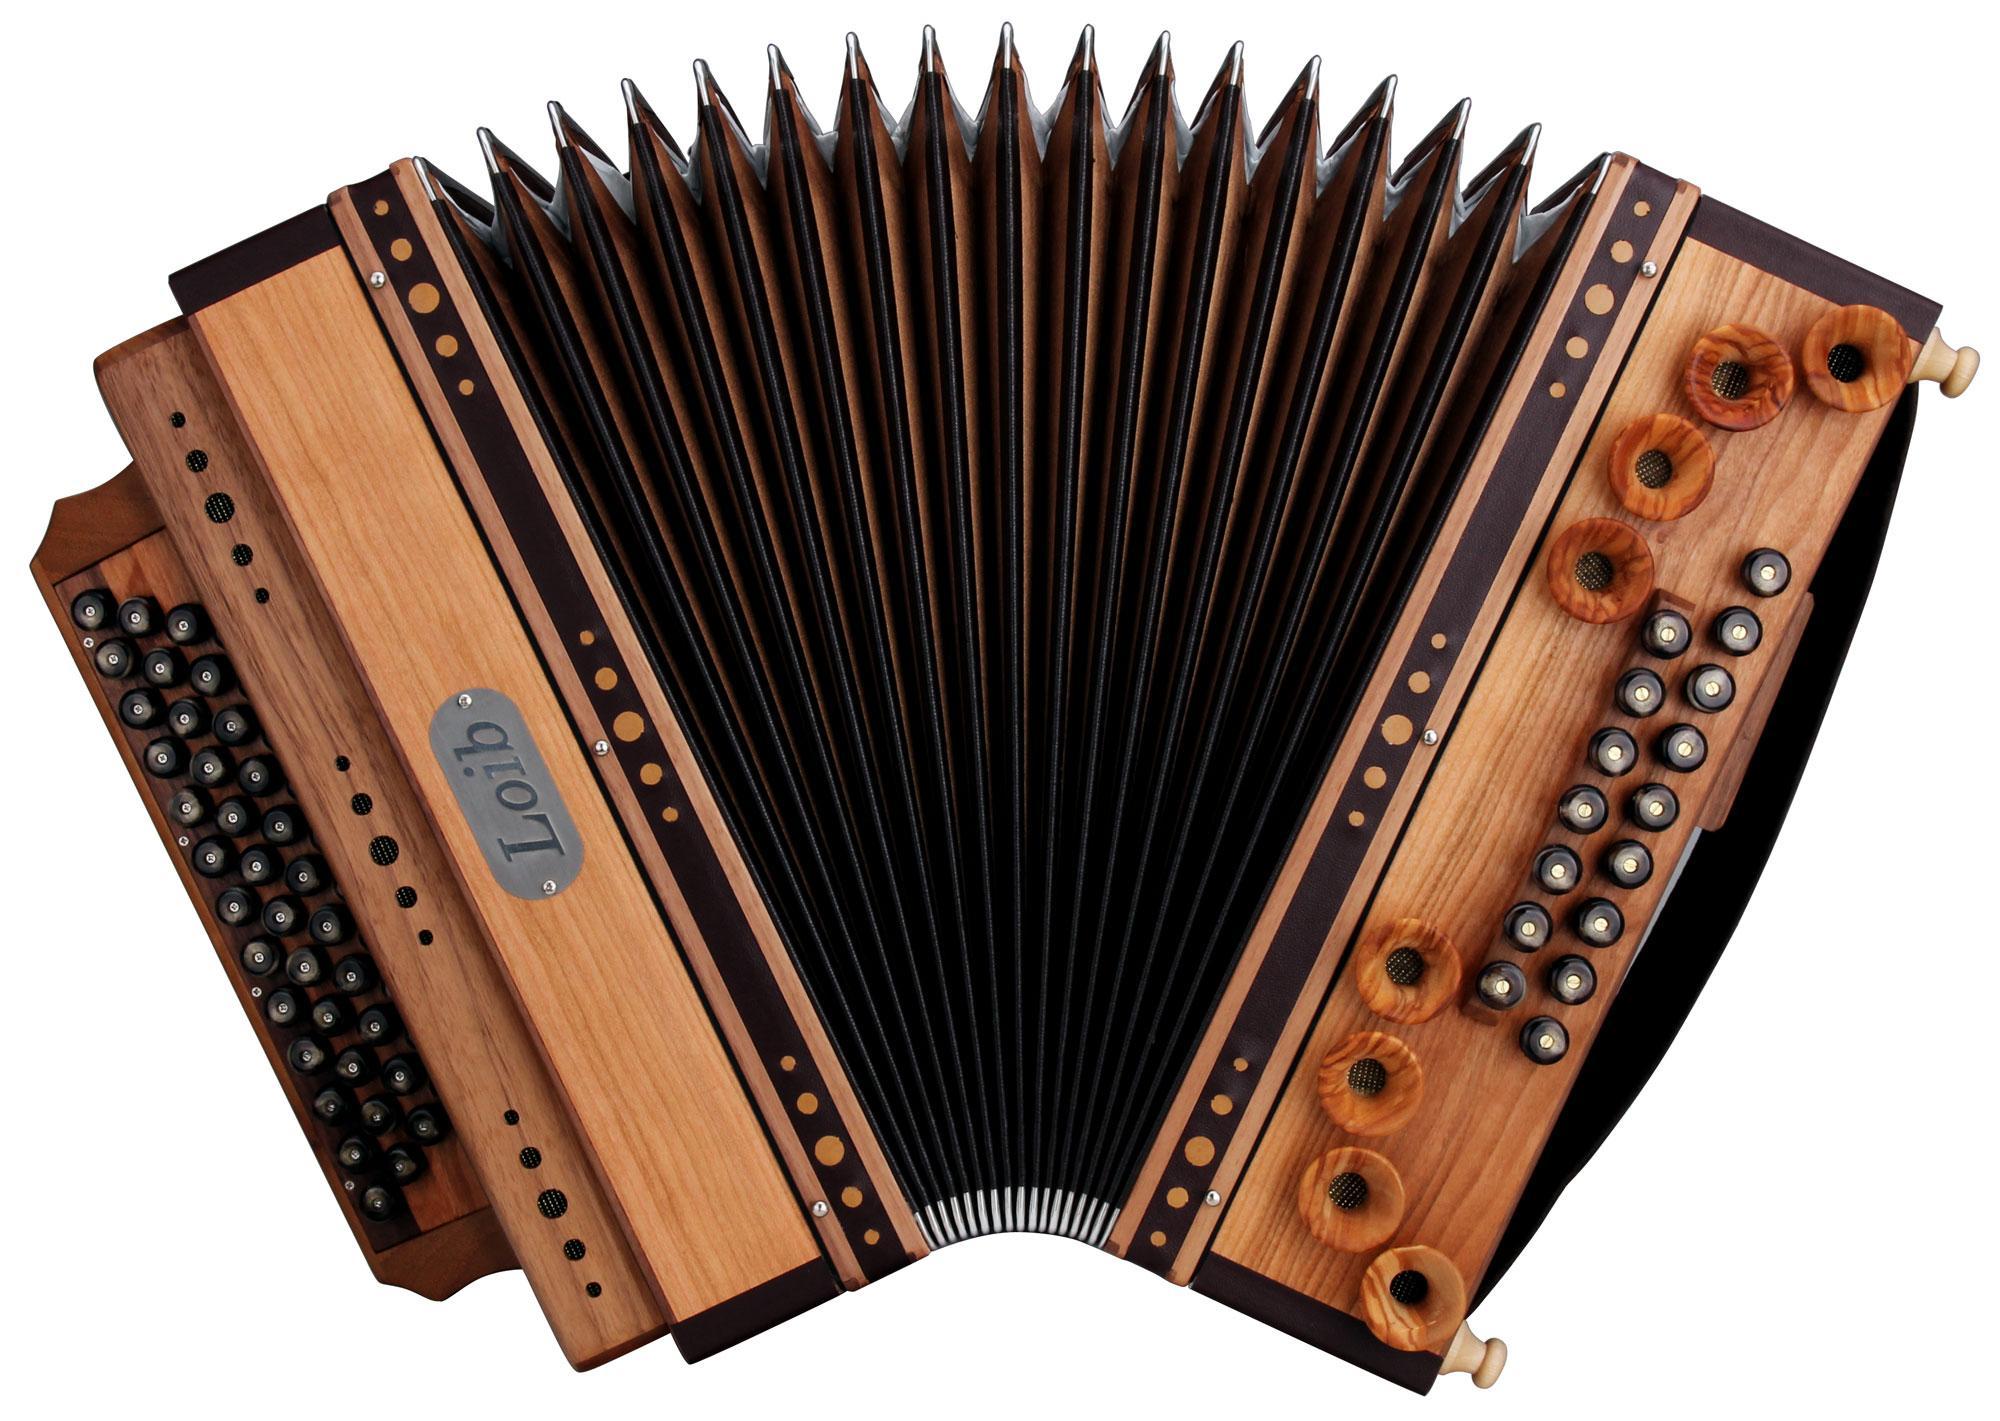 Loib Harmonika IVD Kirsche/Nuss B-Es-As-Des H-Bass X-Bass Holzverdeck